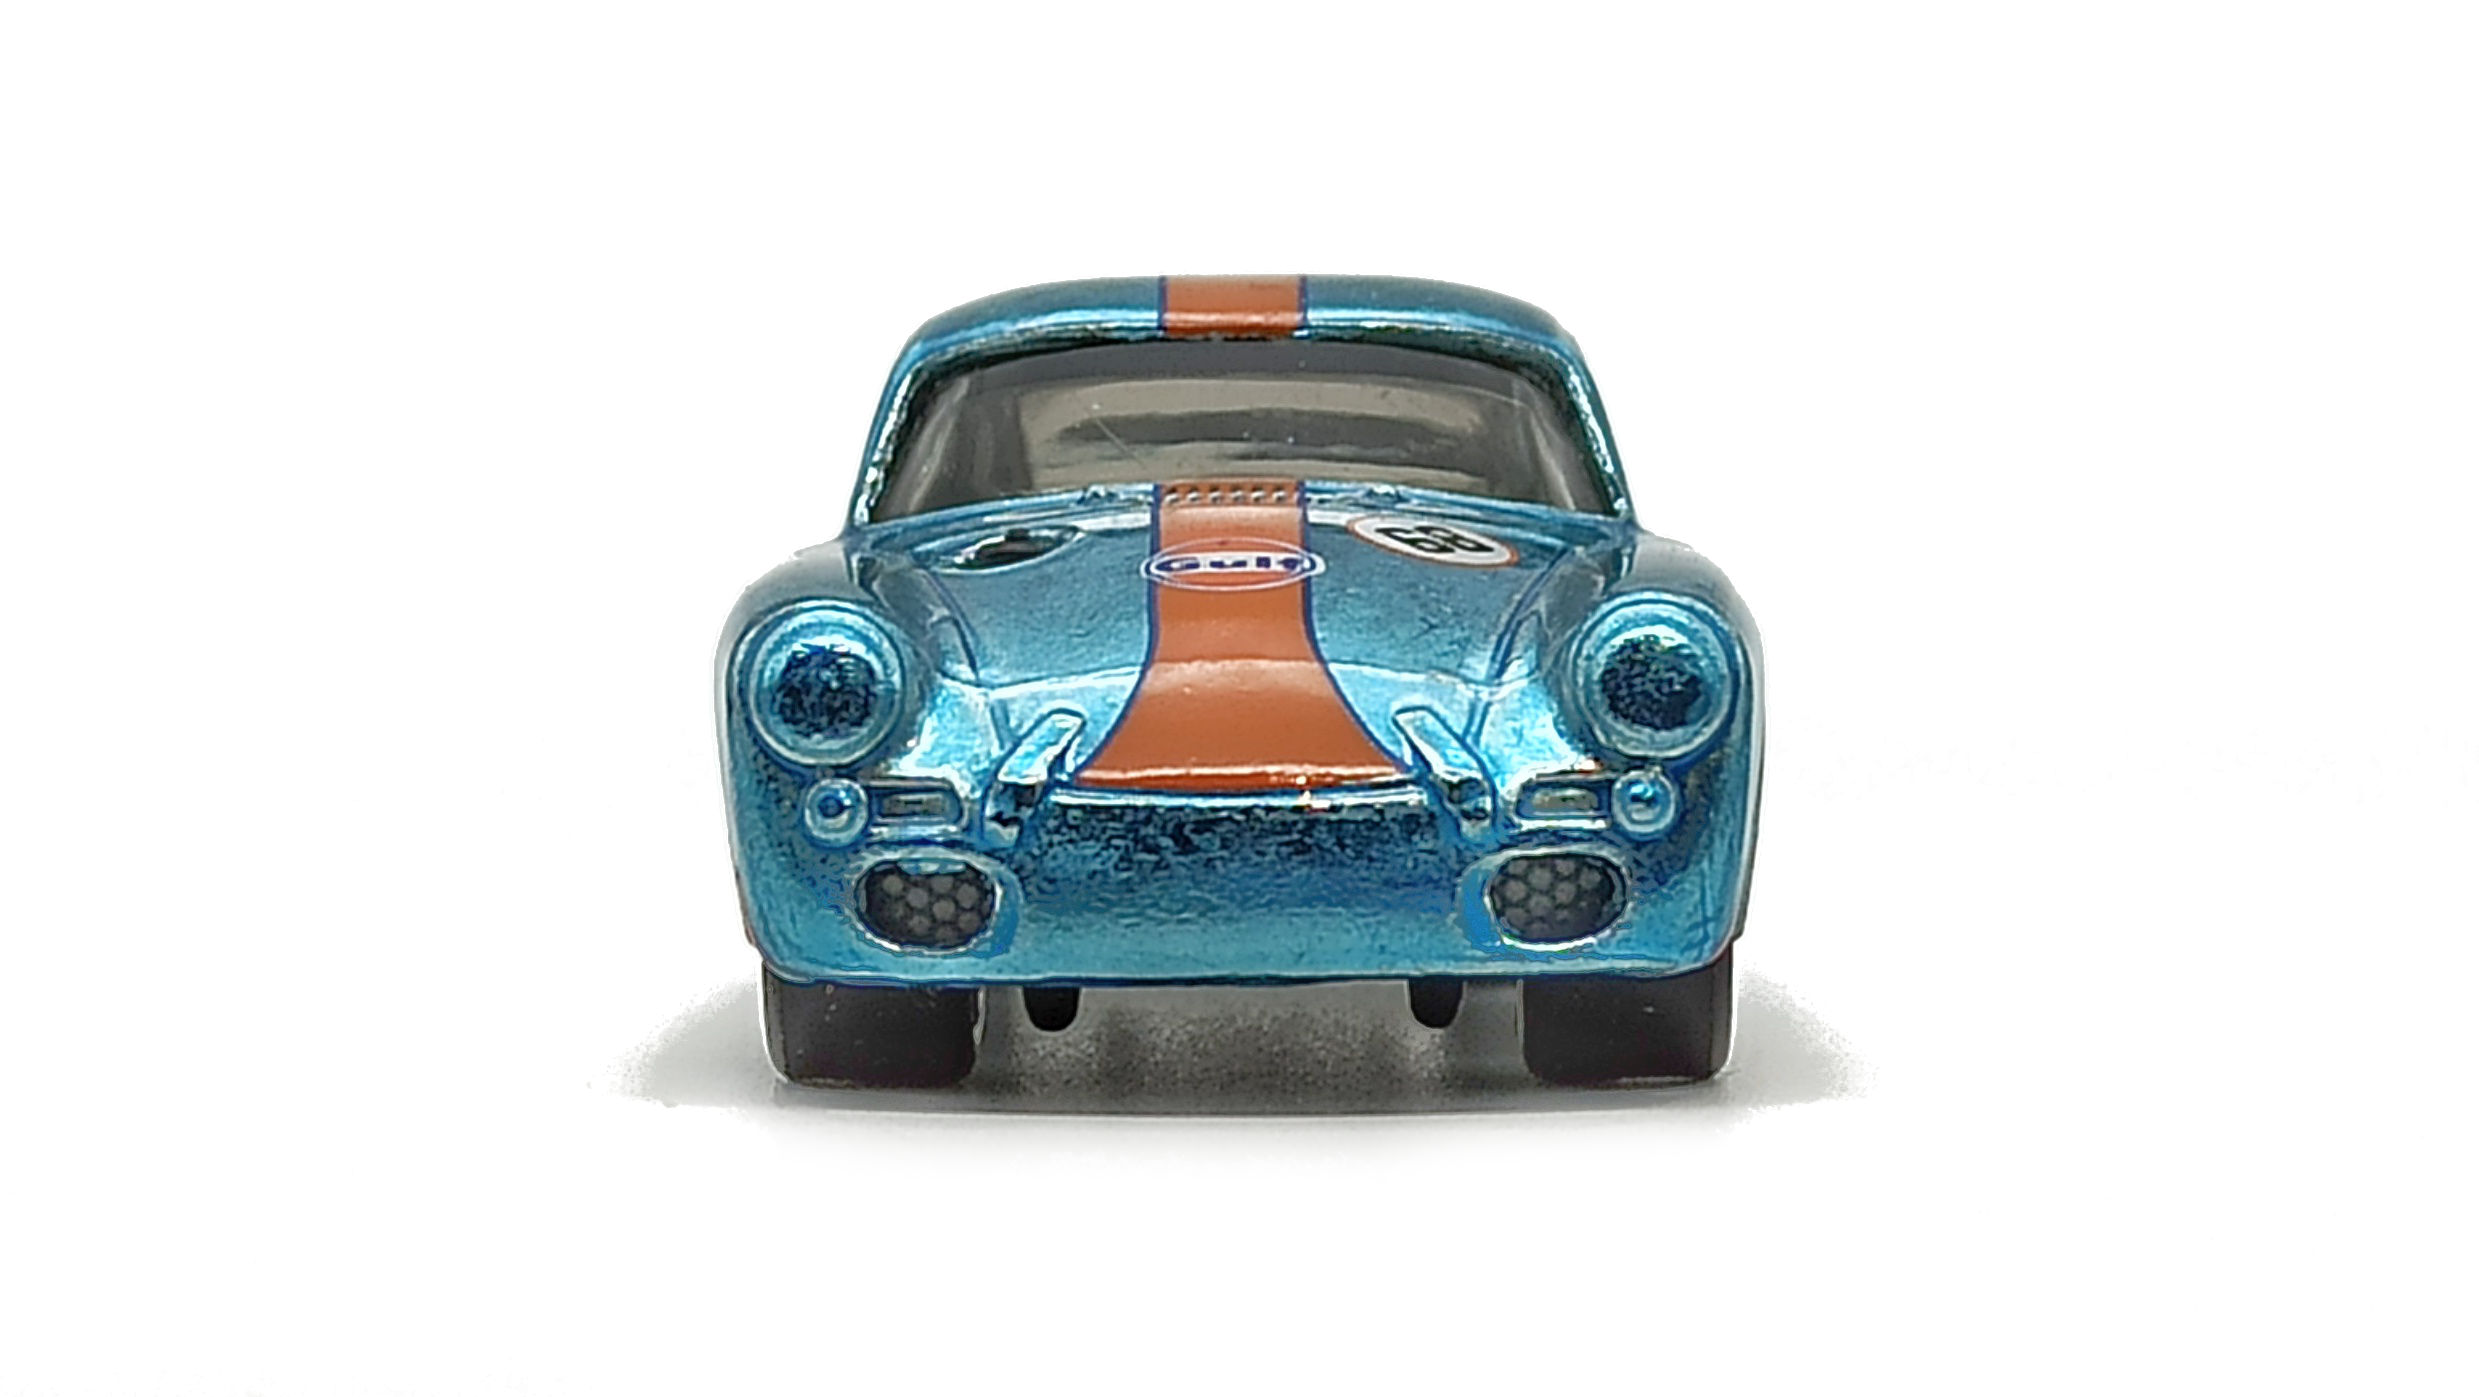 Hot Wheels Porsche 356 Outlaw (GTD08) 2021 (171/250) HW Speed Graphics (7/10) spectraflame light blue (Gulf) Super Treasure Hunt (STH) top